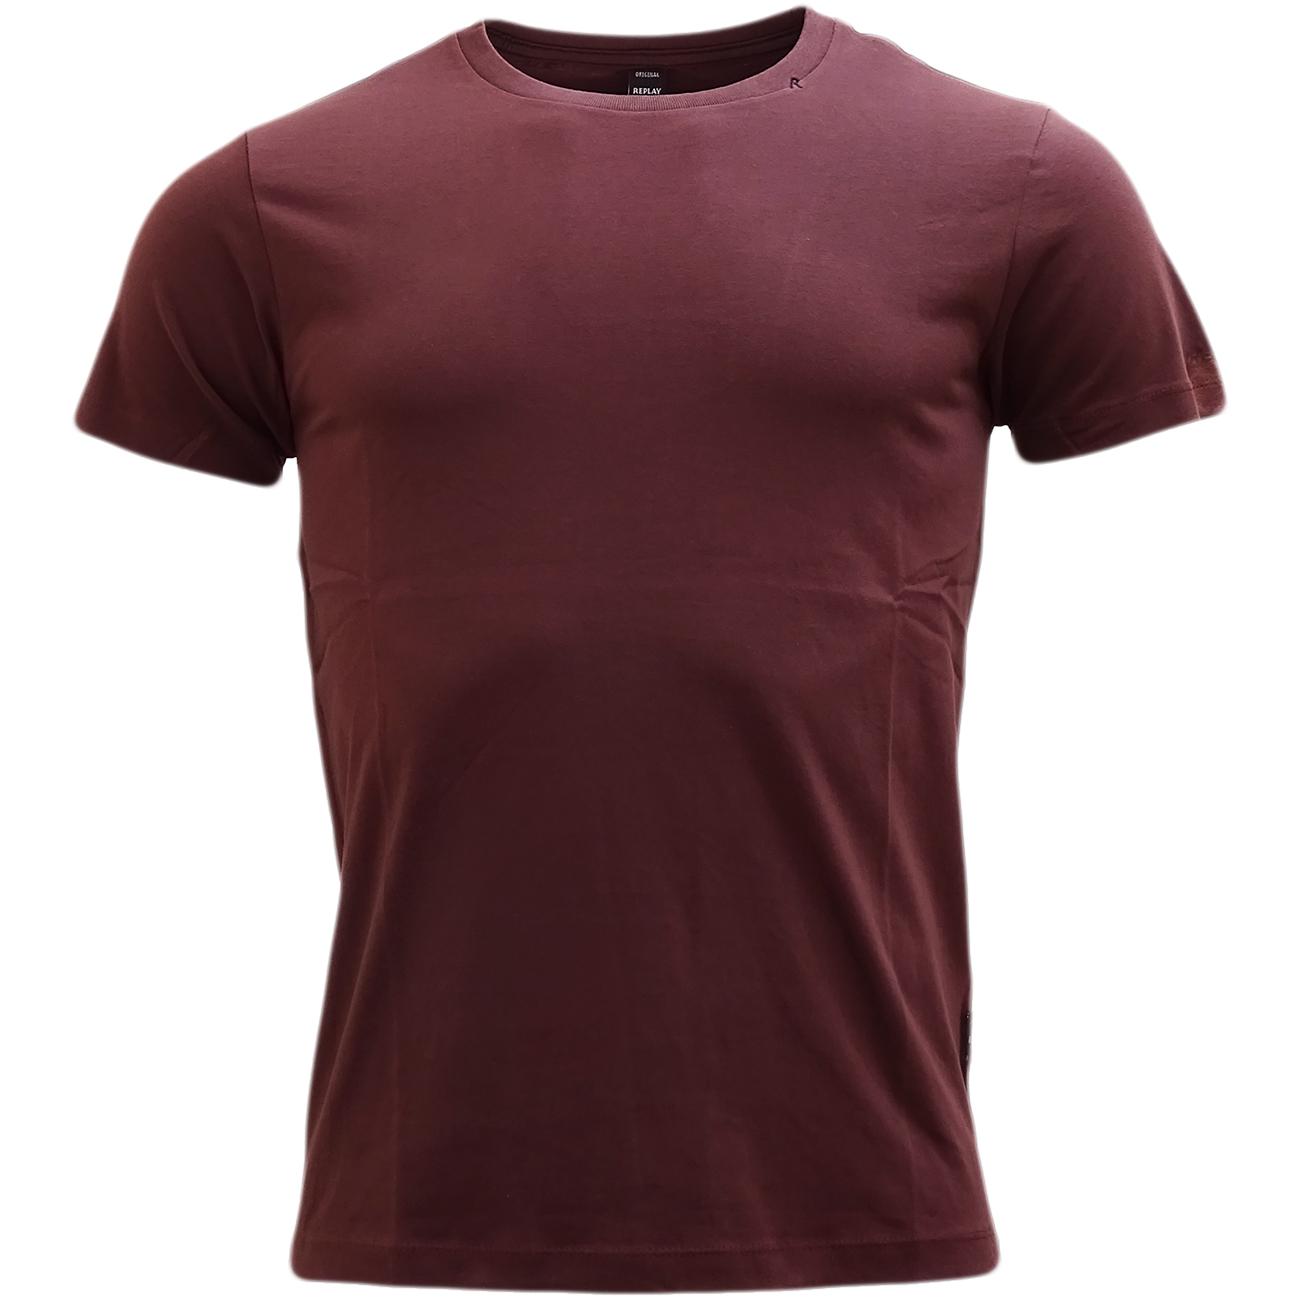 replay plain slim fit t shirt m3039 t shirts mr h. Black Bedroom Furniture Sets. Home Design Ideas